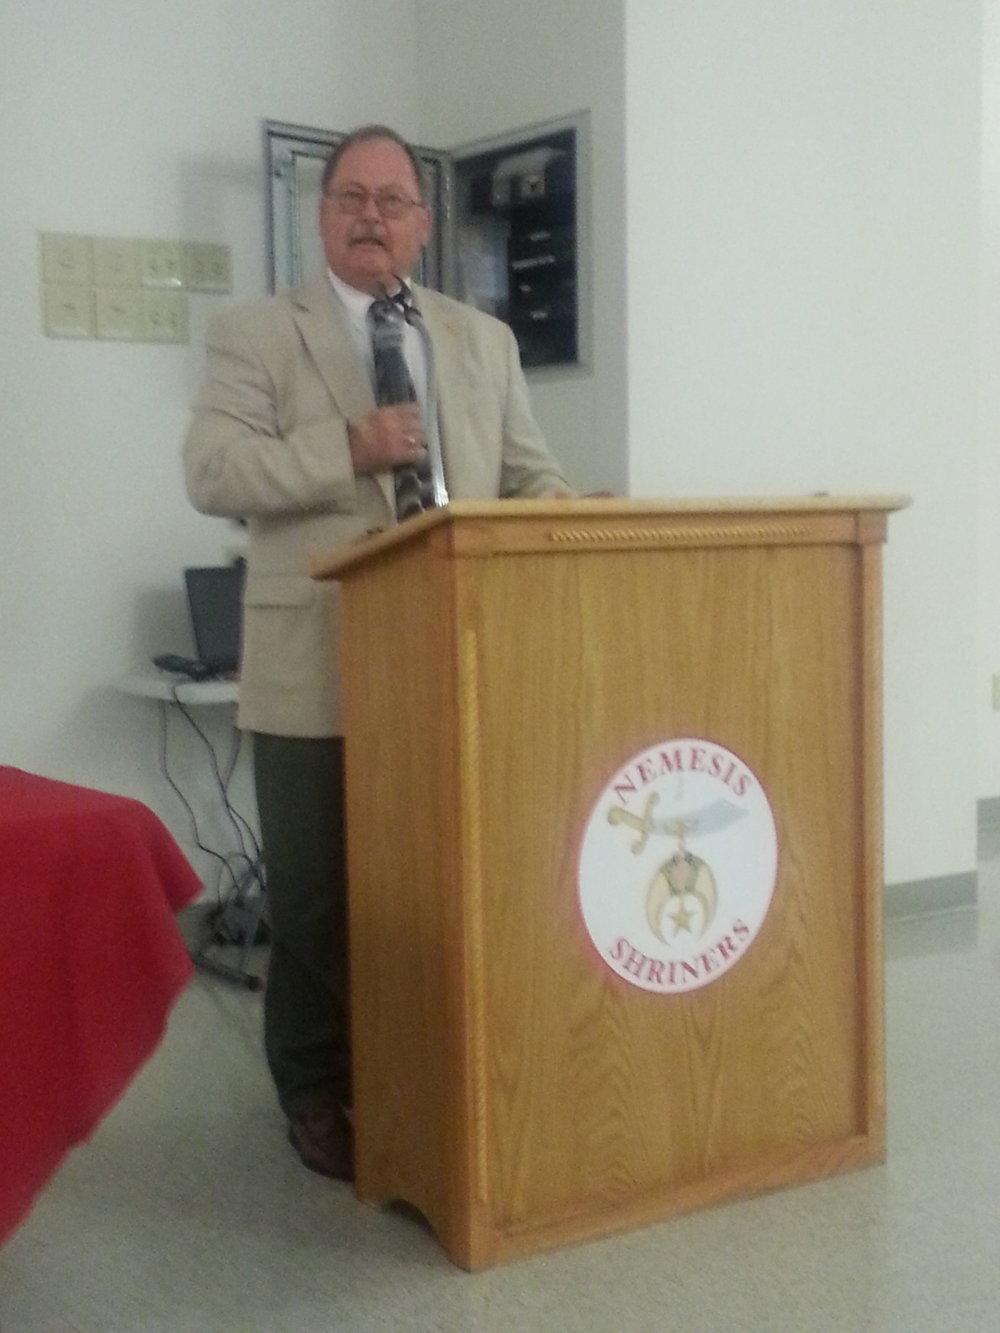 Mayor Randy Rapp